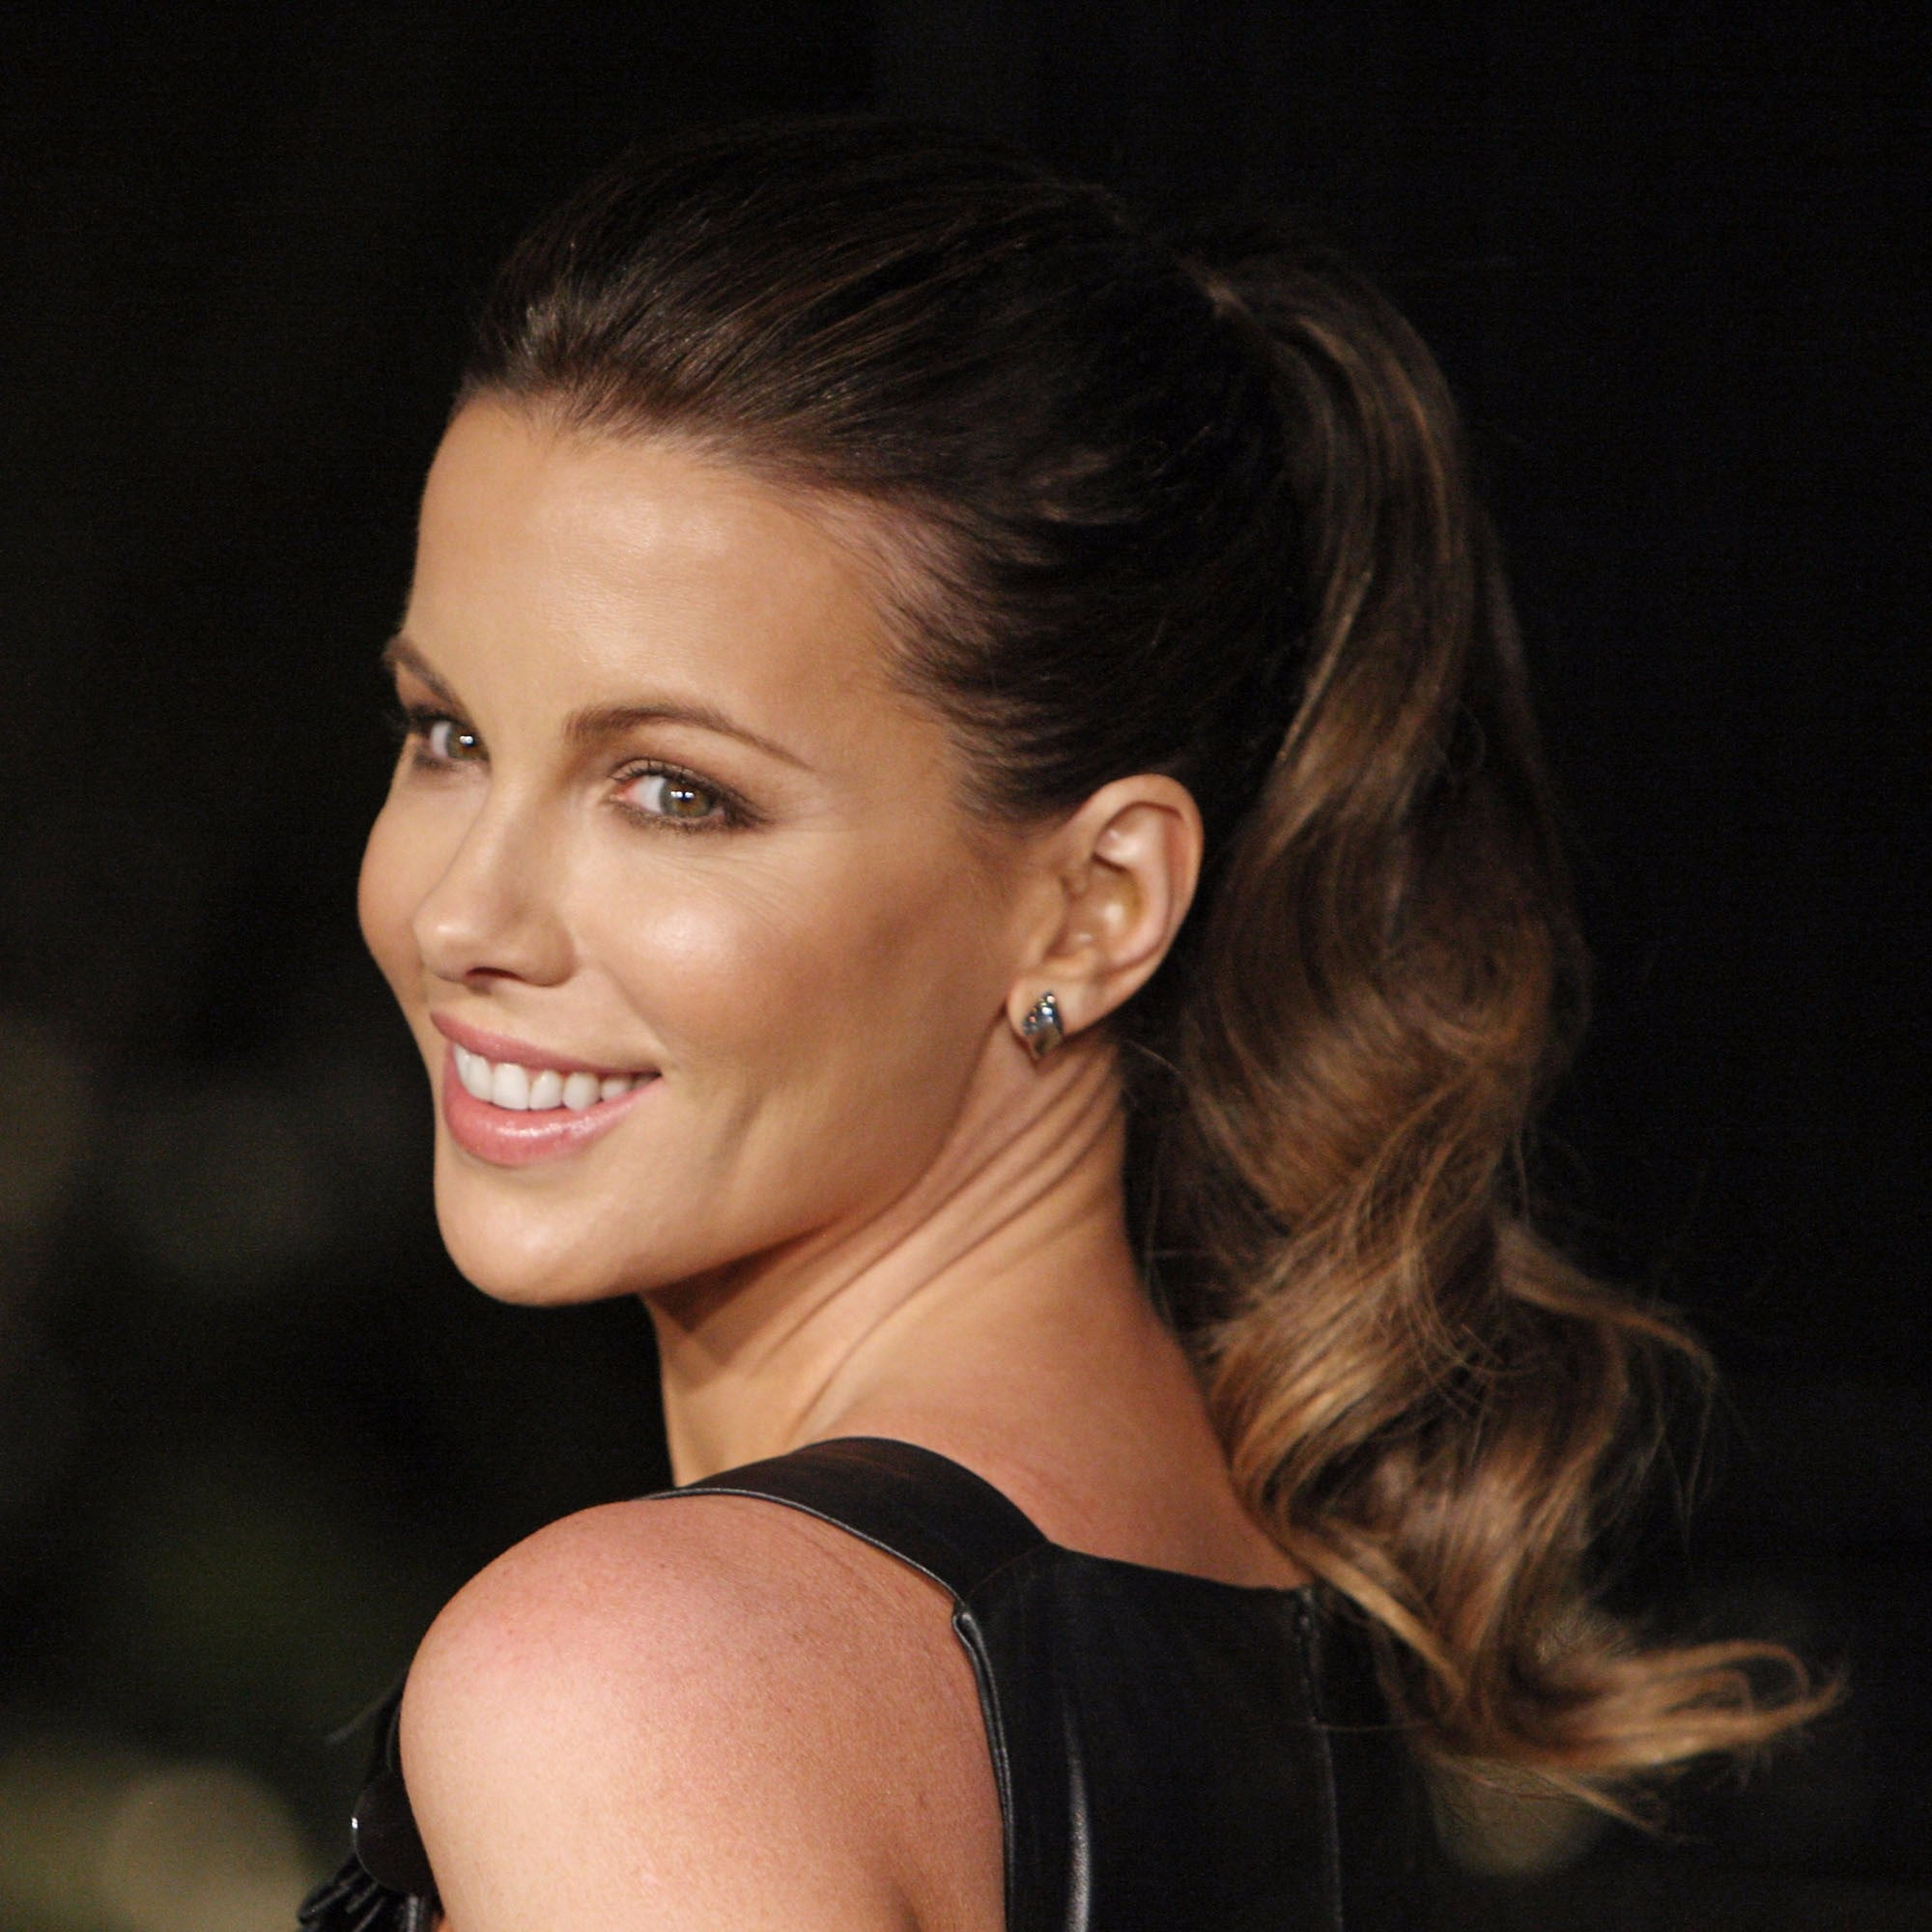 Kate Beckinsale Ponytail Hair Photos Popsugar Beauty Australia